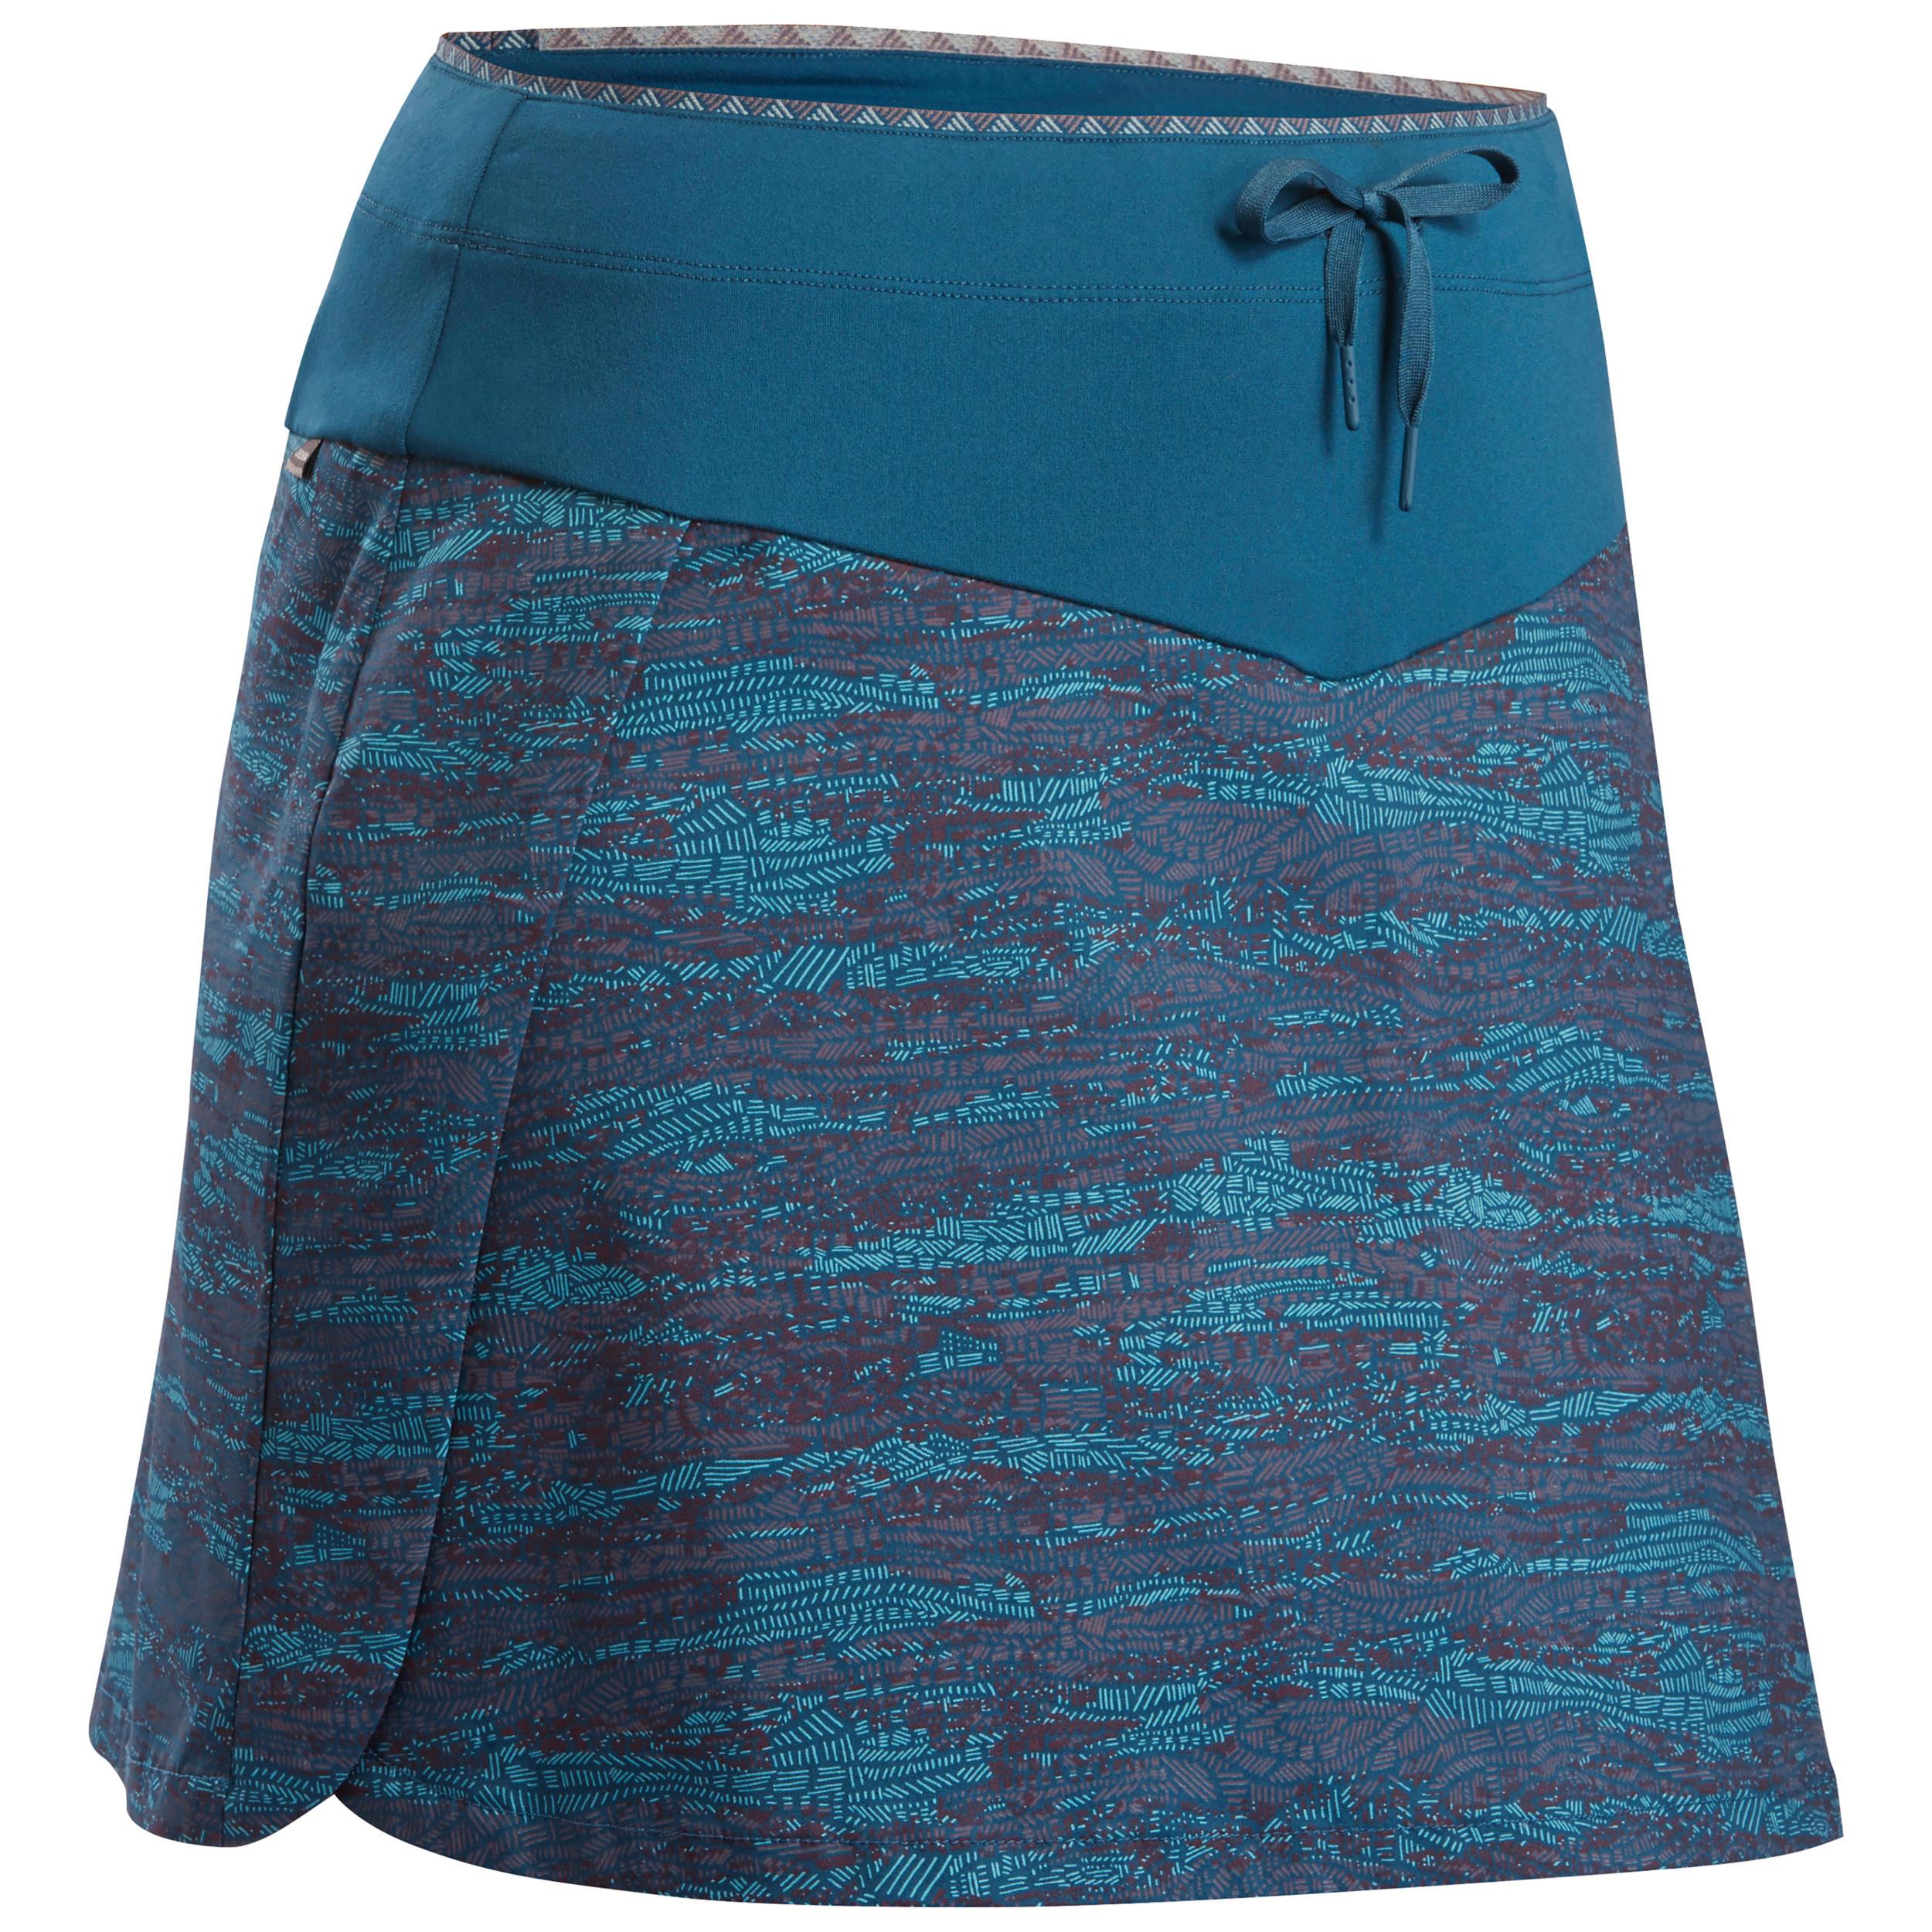 Fustă pantalon NH500 damă la Reducere poza